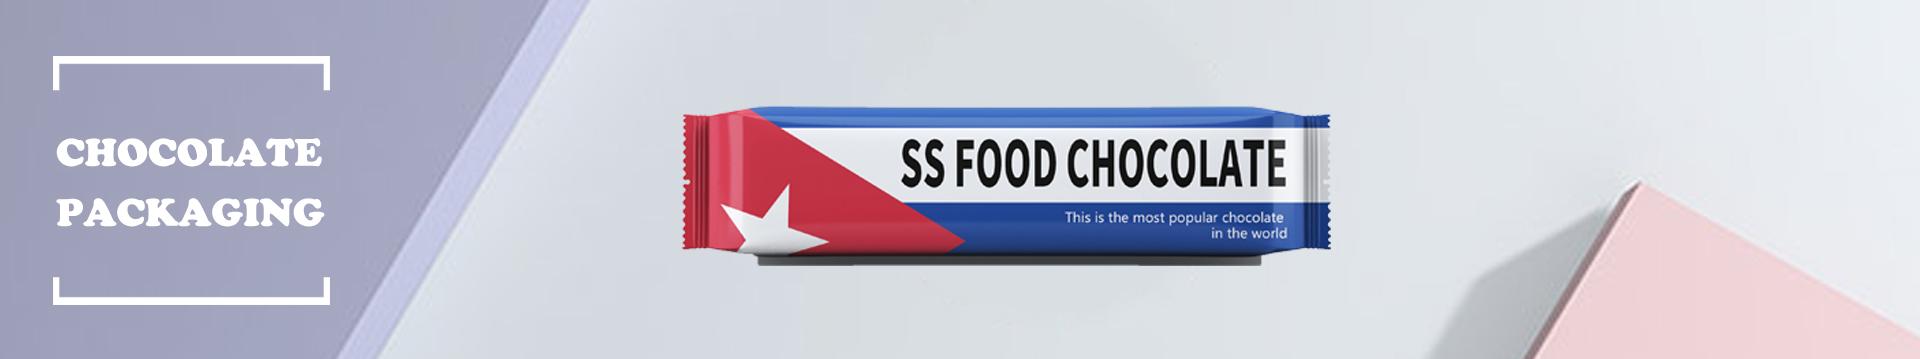 Chocolate Packaging-Yucai